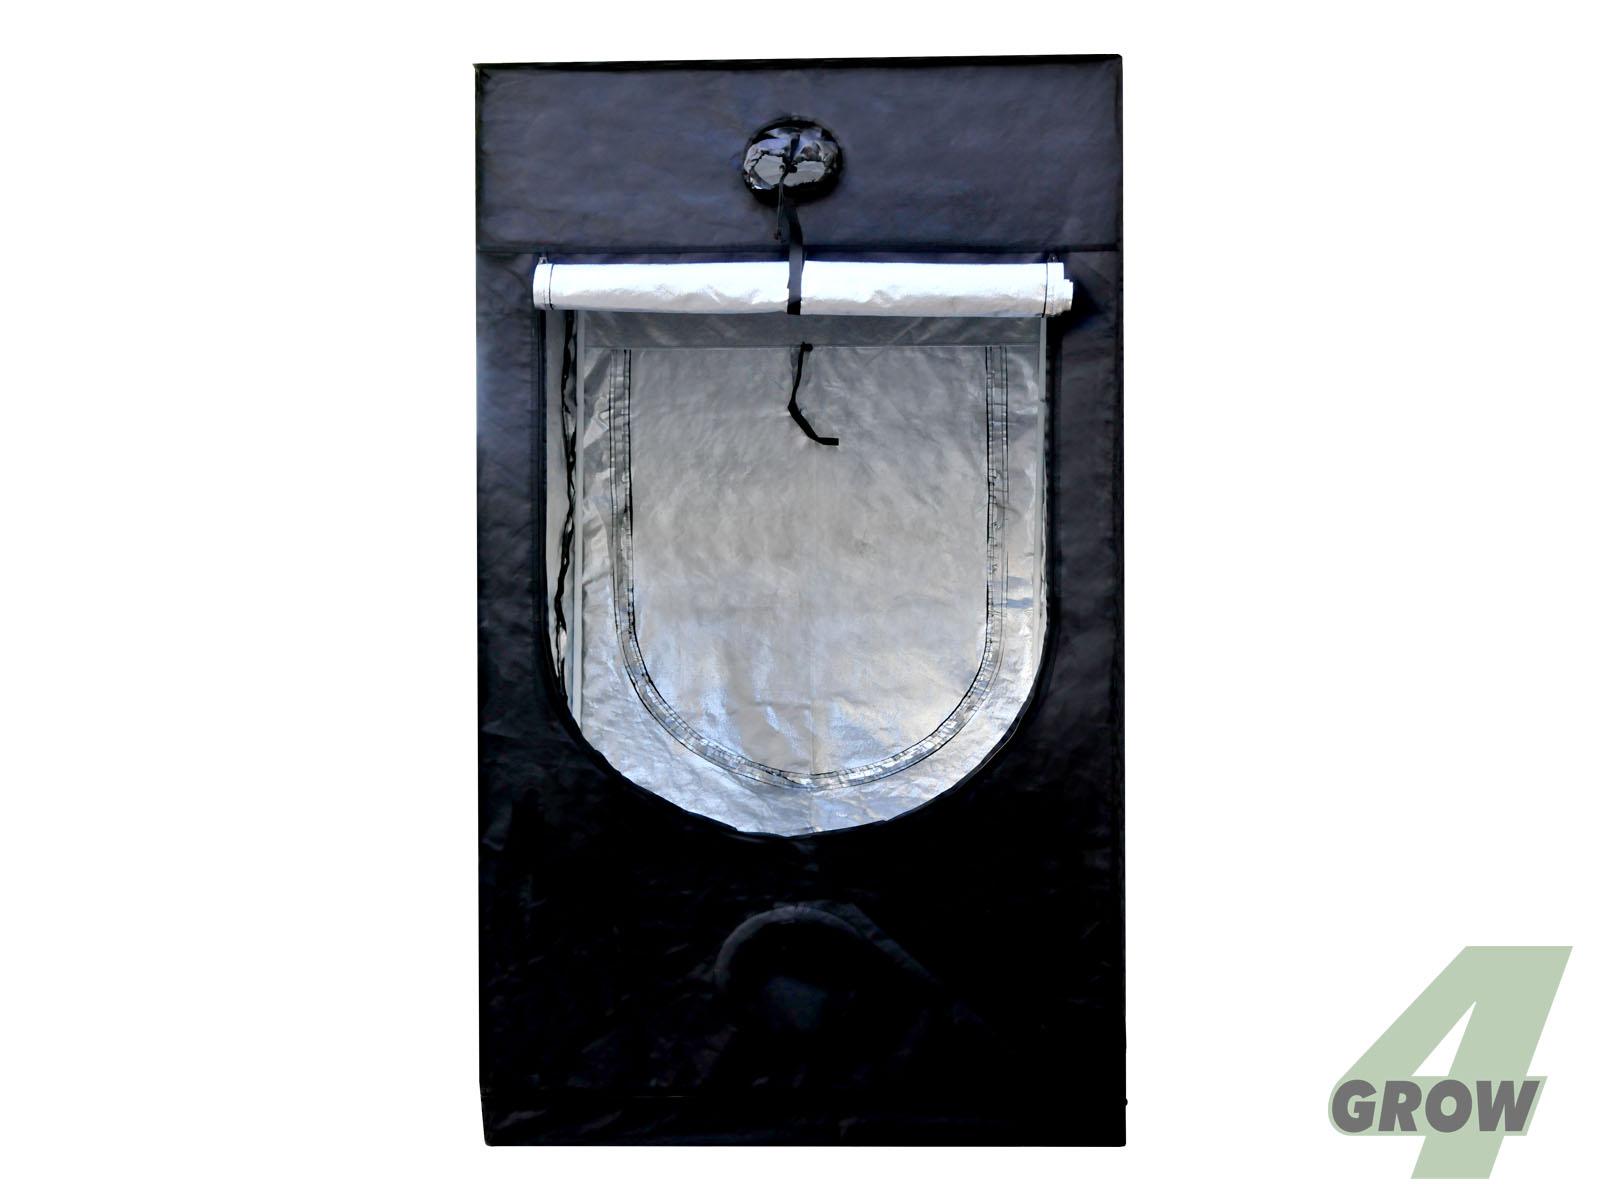 pflanzenlampe led pflanzenlampe pflanzenzelt growshop 4grow growzelt bs120 growbox mit 1 44. Black Bedroom Furniture Sets. Home Design Ideas